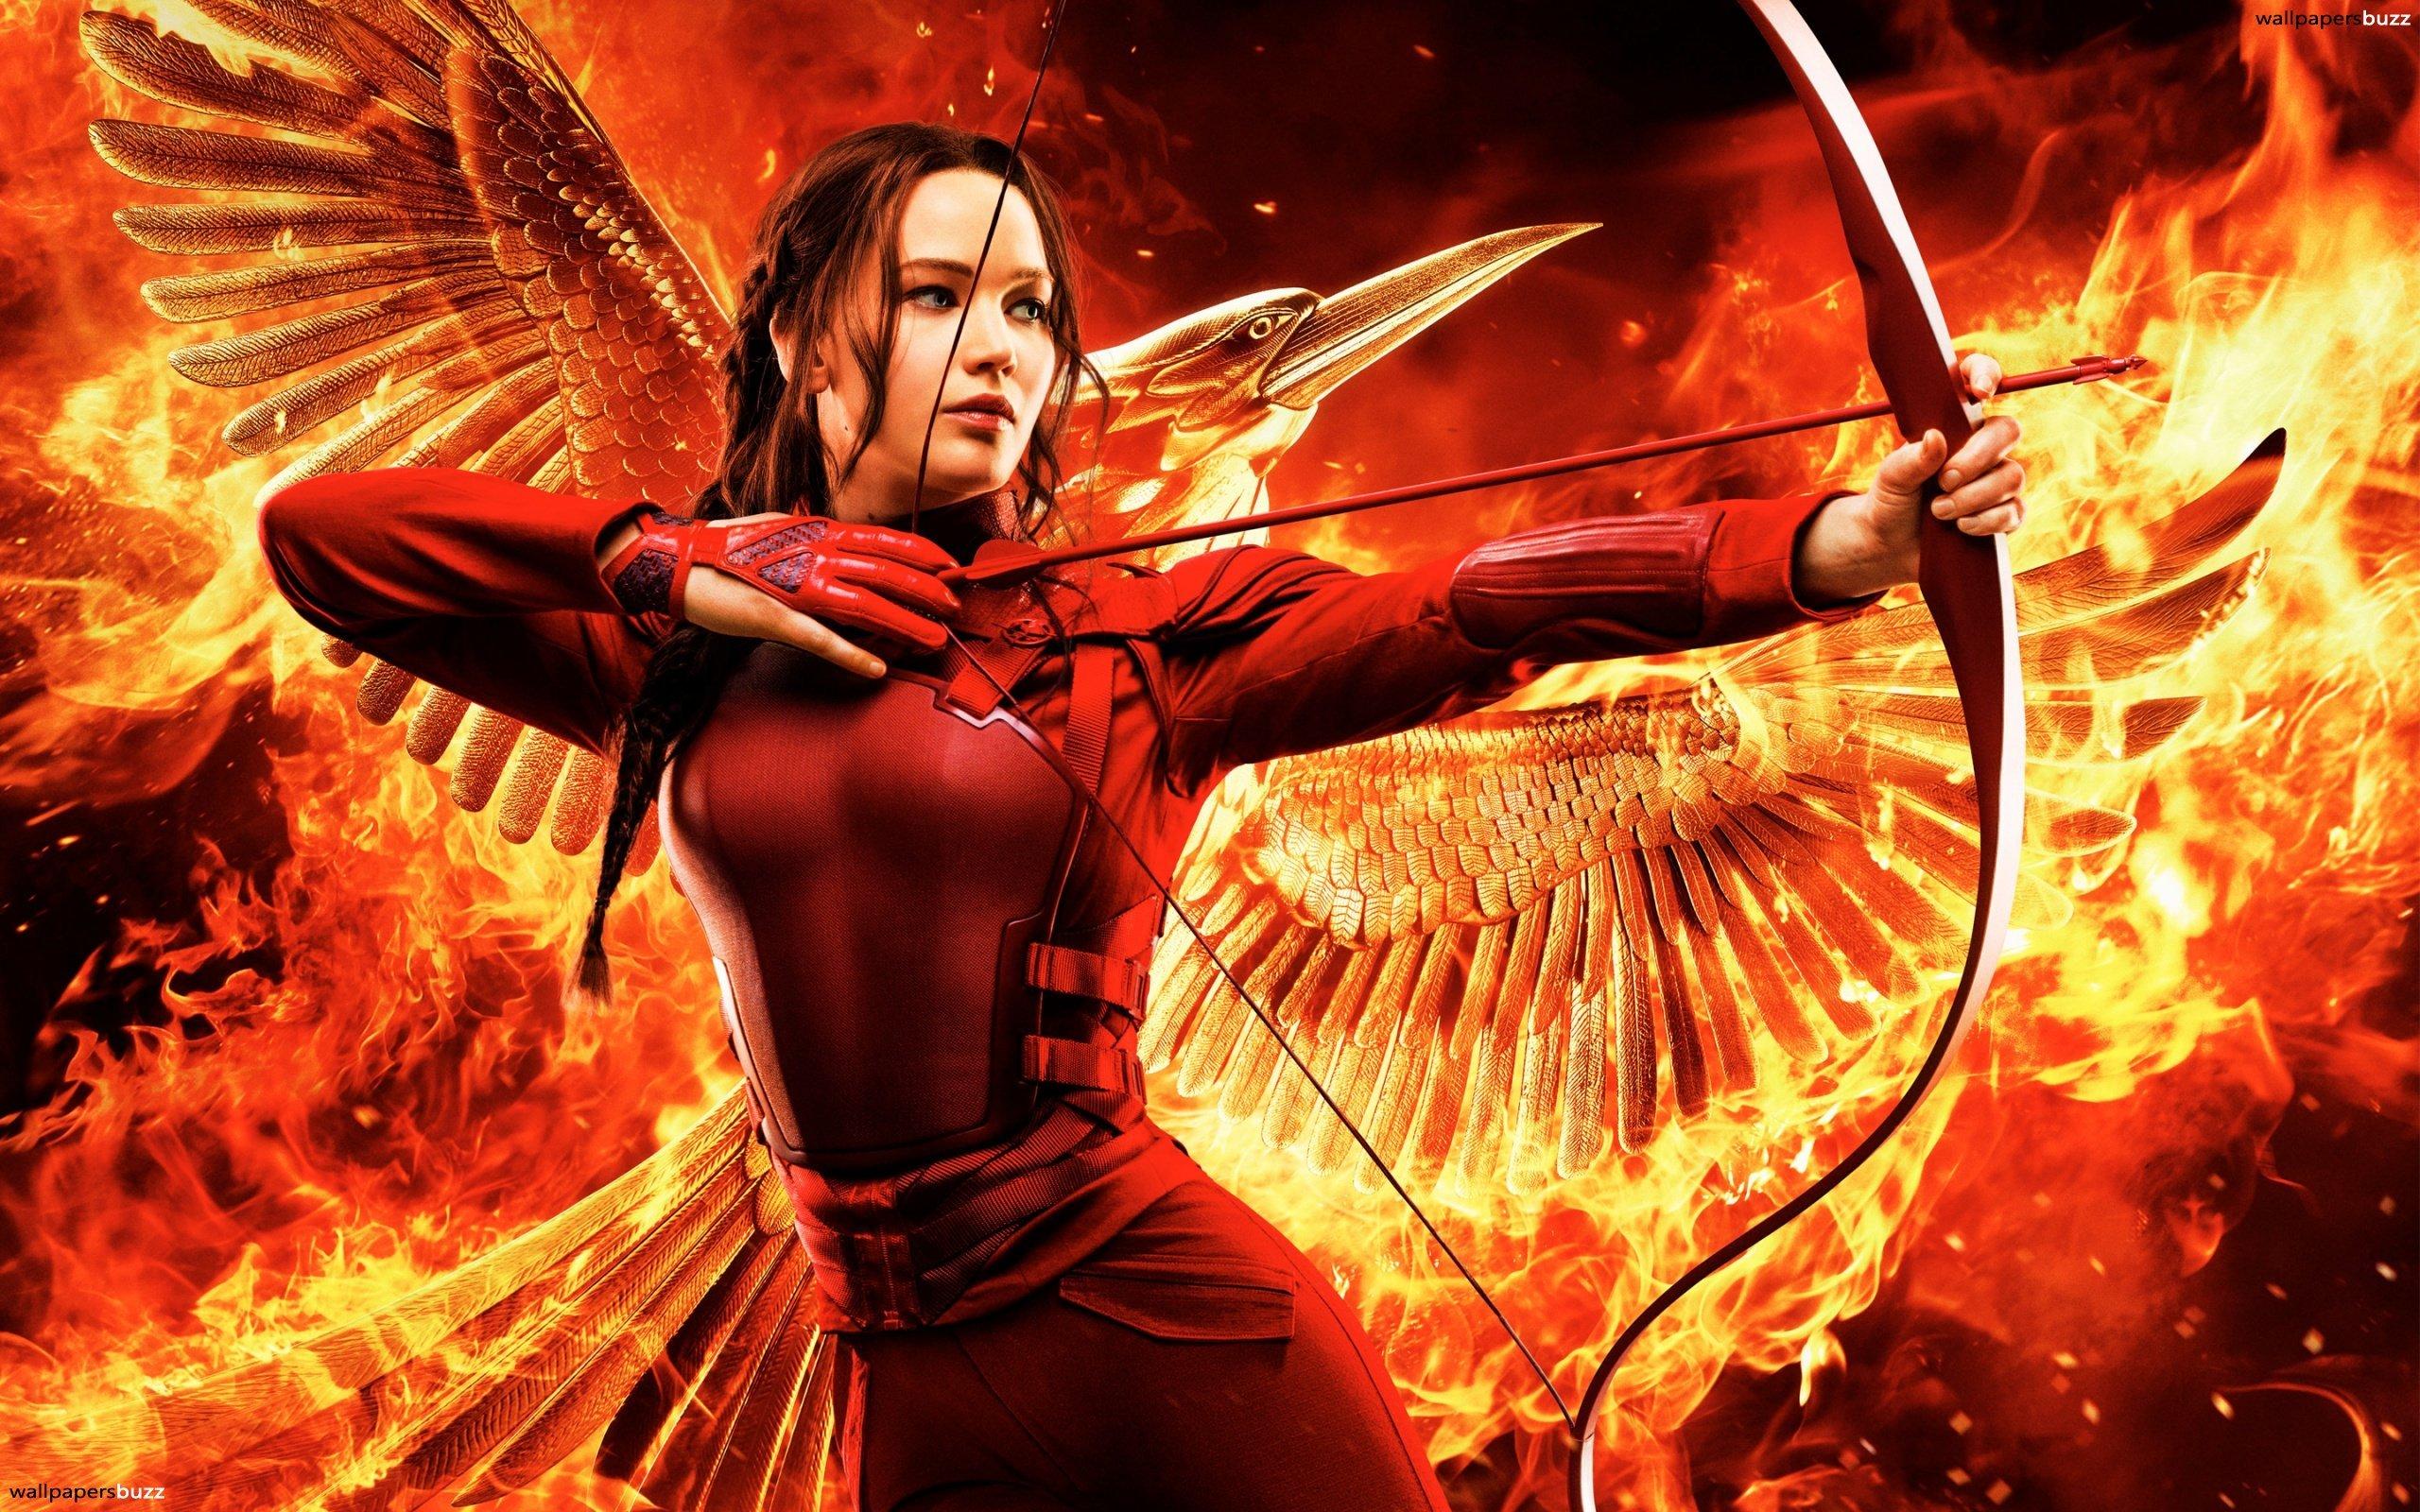 Katniss shoots a bow HD Wallpaper 2560x1600